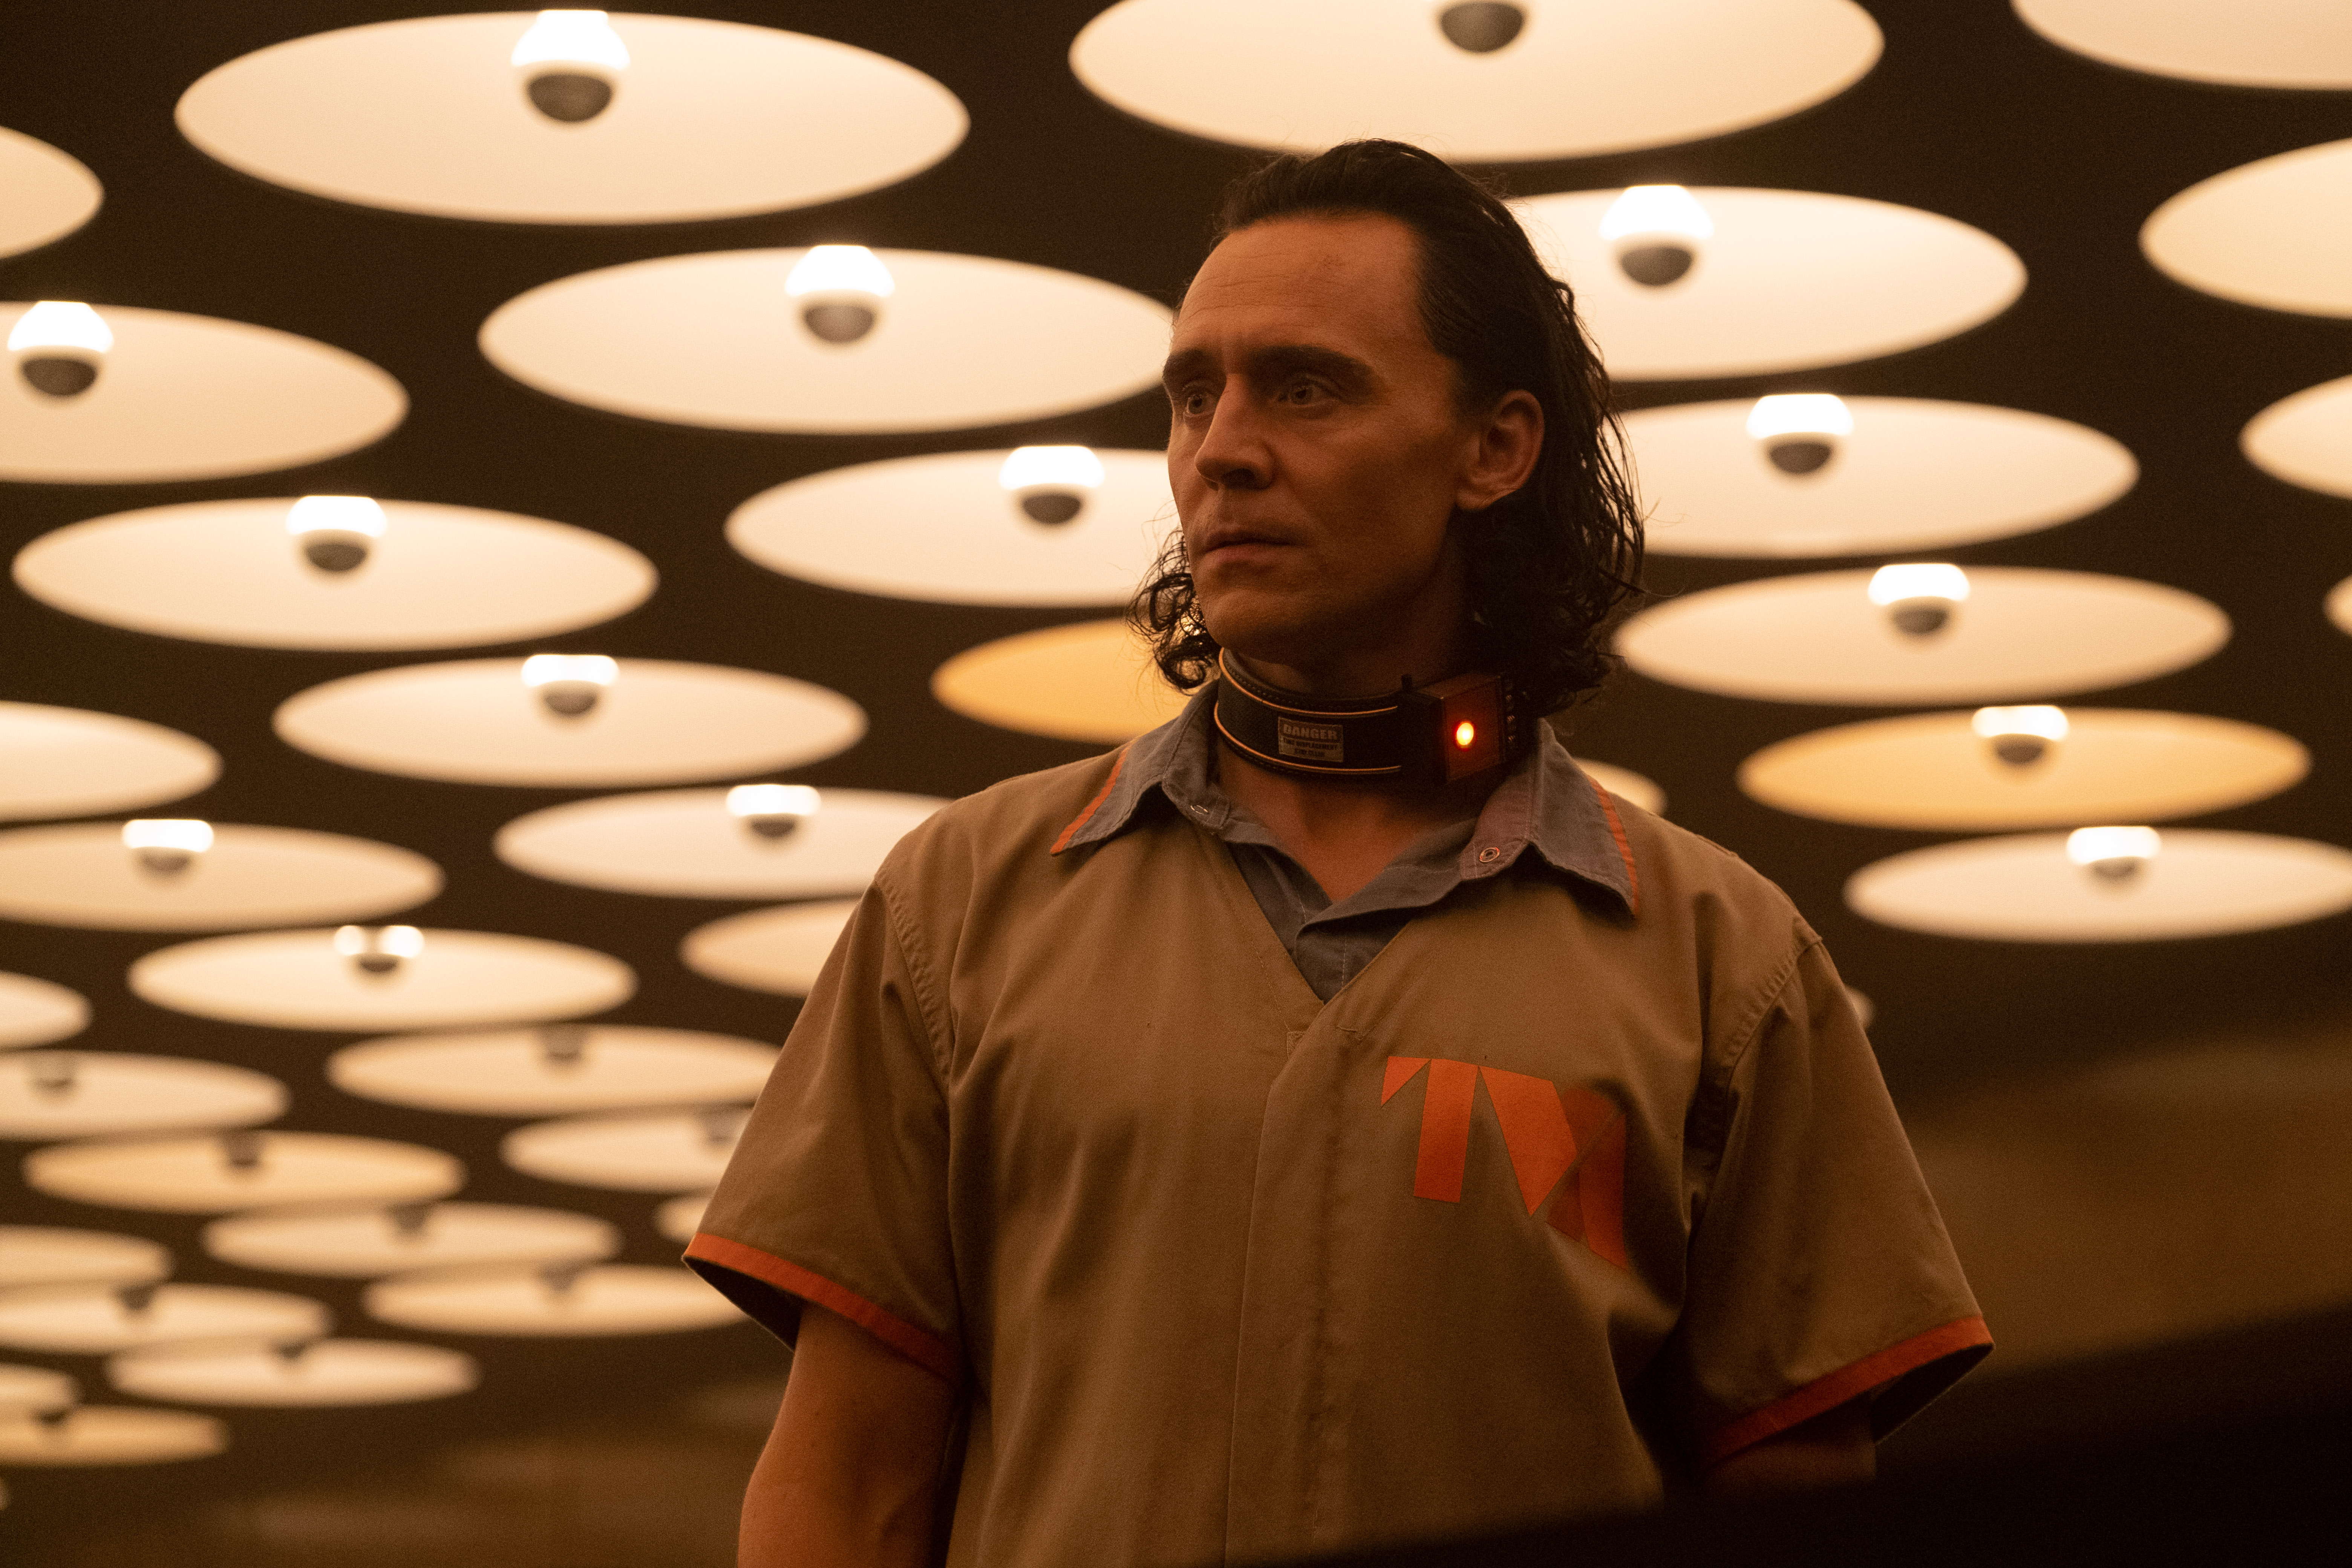 Loki (Tom Hiddleston) na LOKI da Marvel Studios, exclusivamente na Disney +.  Foto de Chuck Zlotnick.  © Marvel Studios 2021. Todos os direitos reservados.